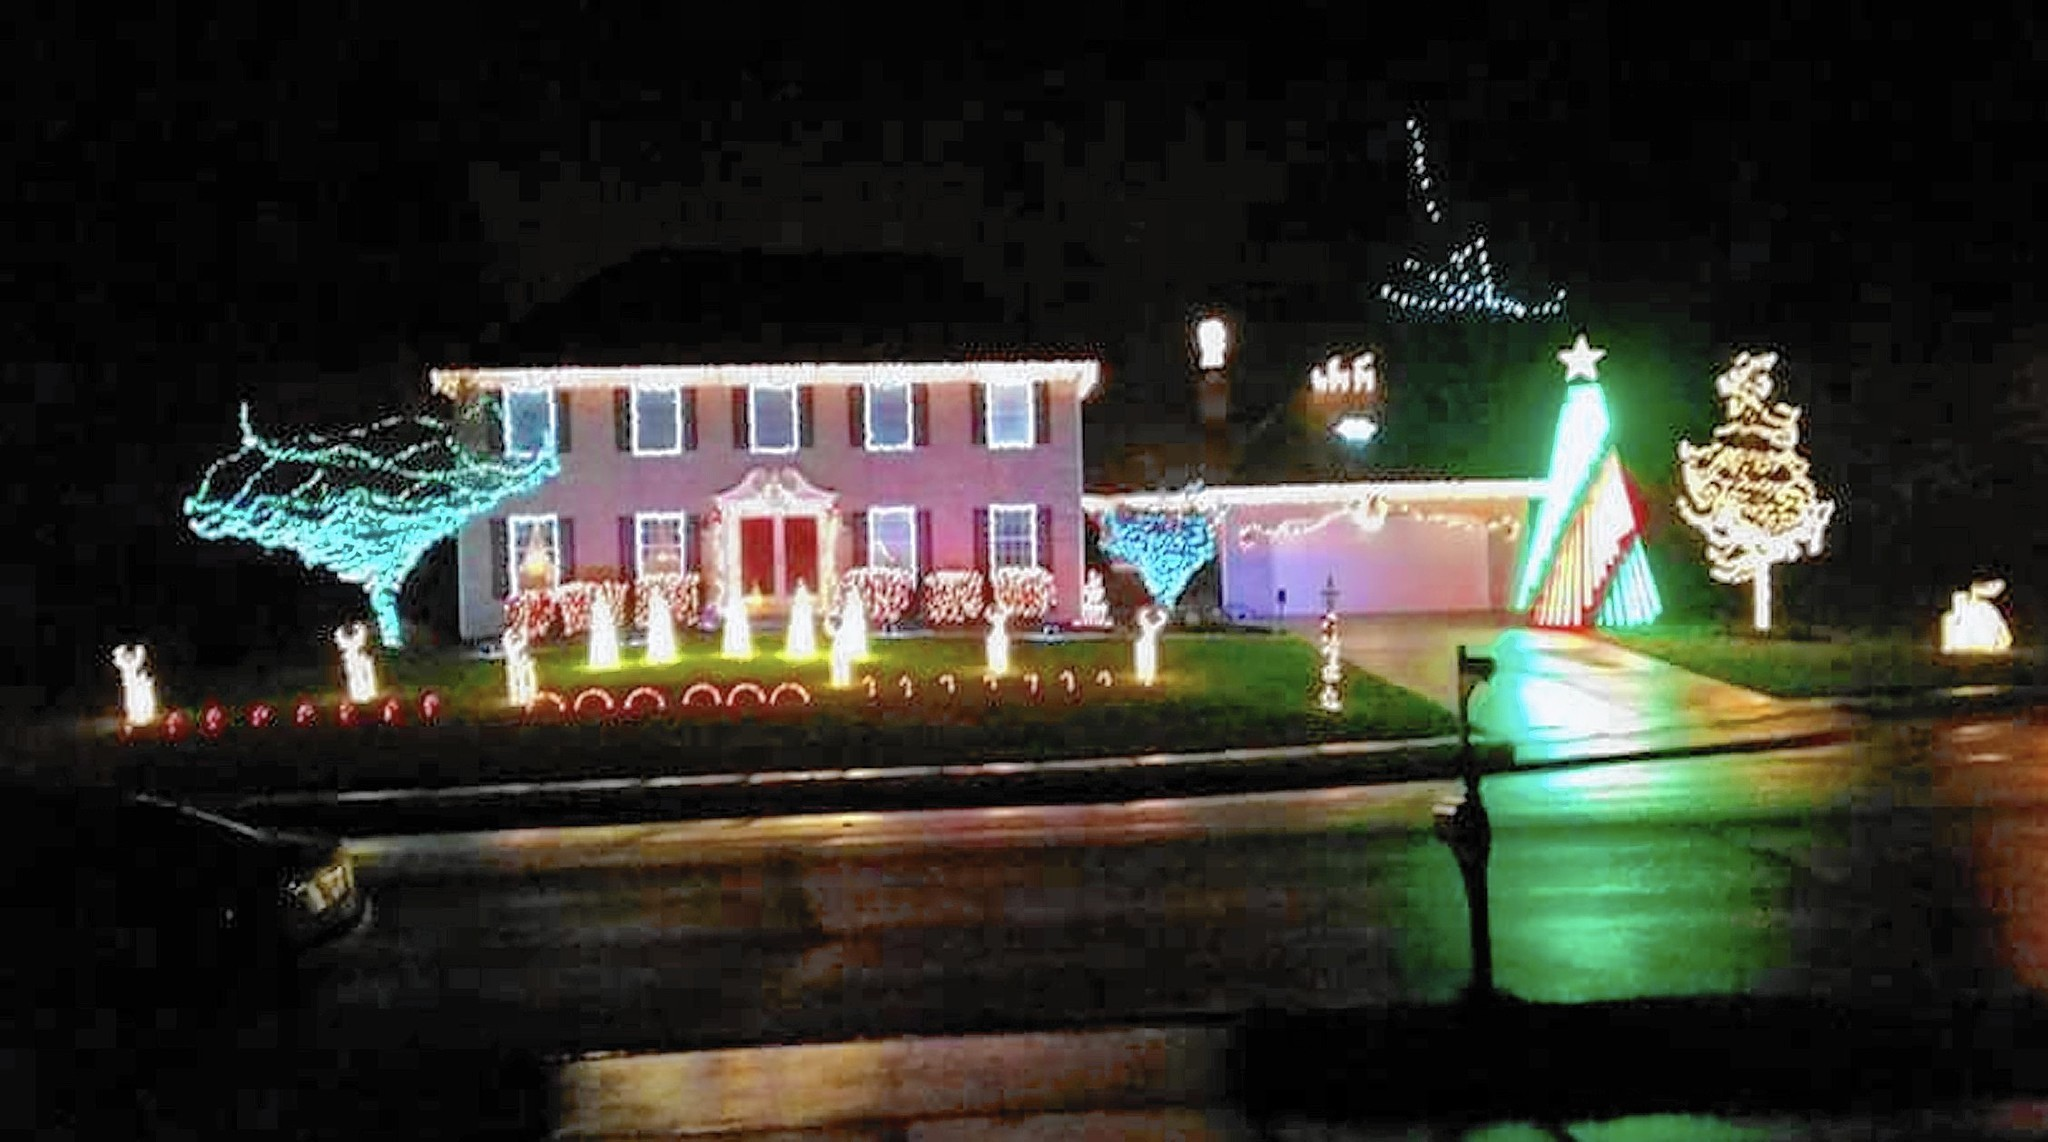 Brad's Bel Air light show is ready for 'A Blue Christmas' starting Thursday, Dec. 1